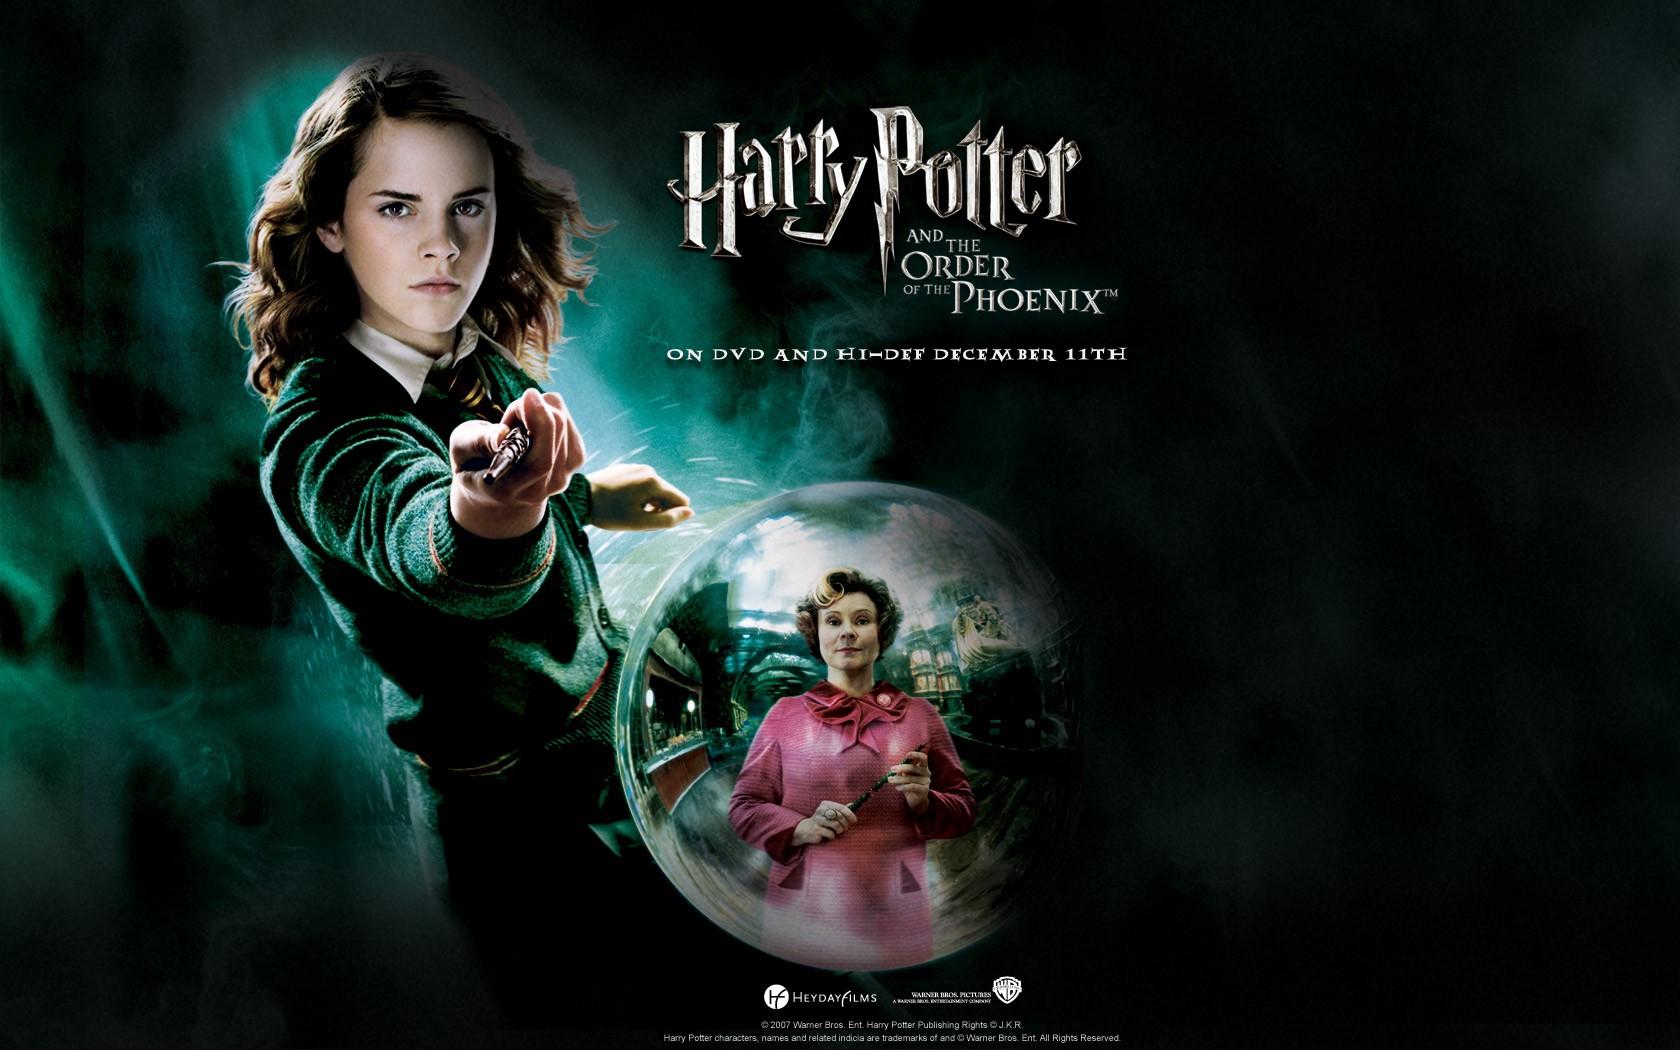 Un wallpaper ufficiale per Harry Potter and the Order of the Phoenix con Emma Watson